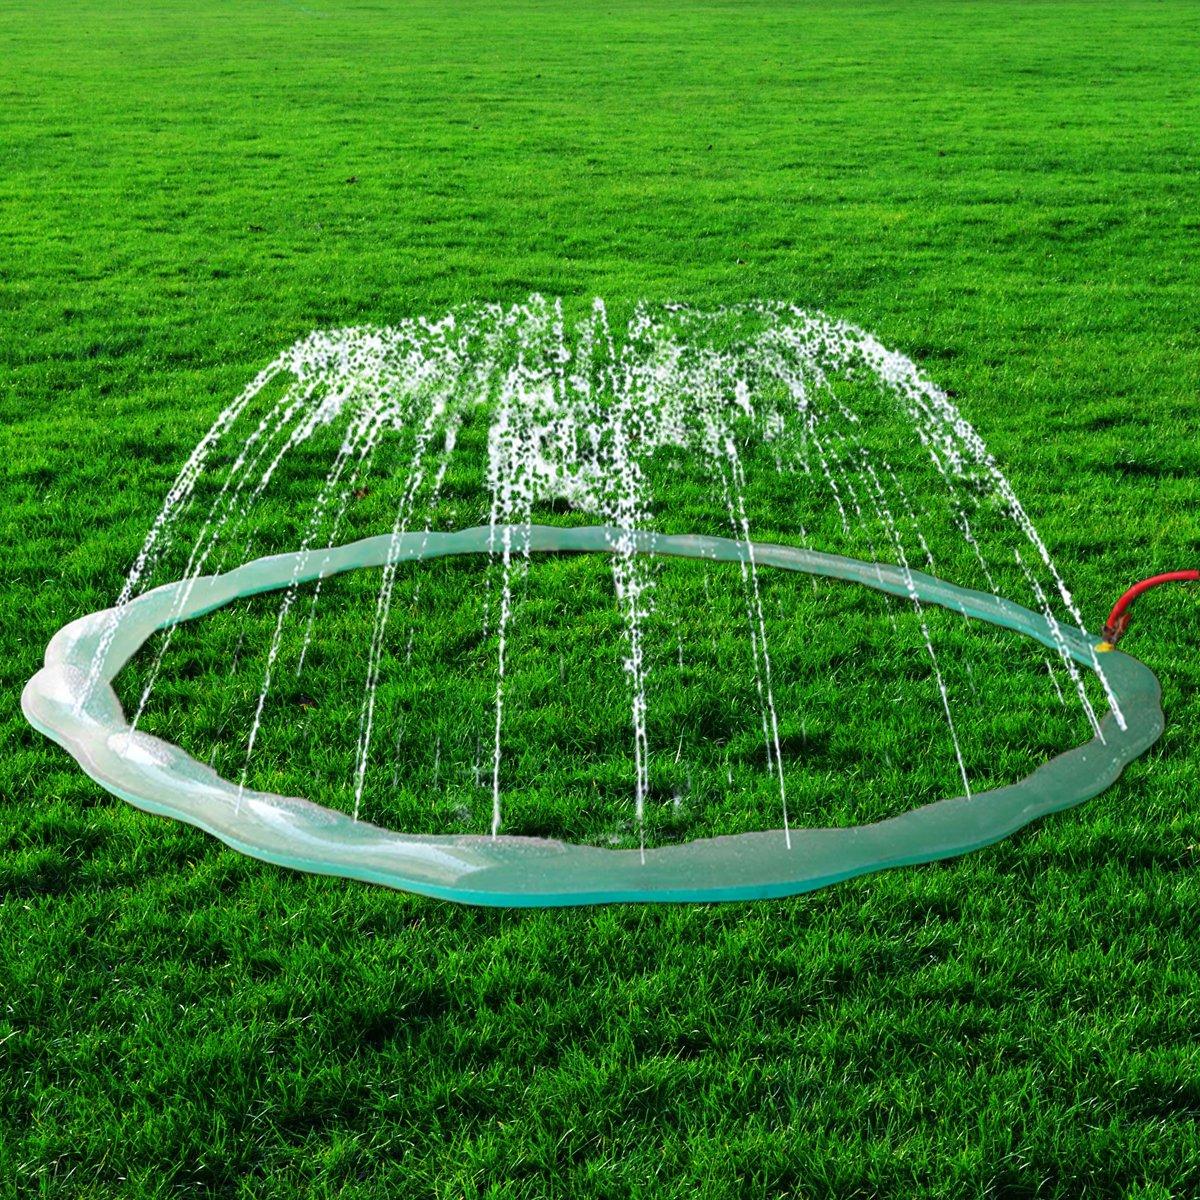 Redstore Sprinkle & Spray Play Ring Toy Splash Sprinkler Summer Inflatable Outdoor Water Sprinkler Lawn Party Beach Pool for Infants Toddlers & Kids